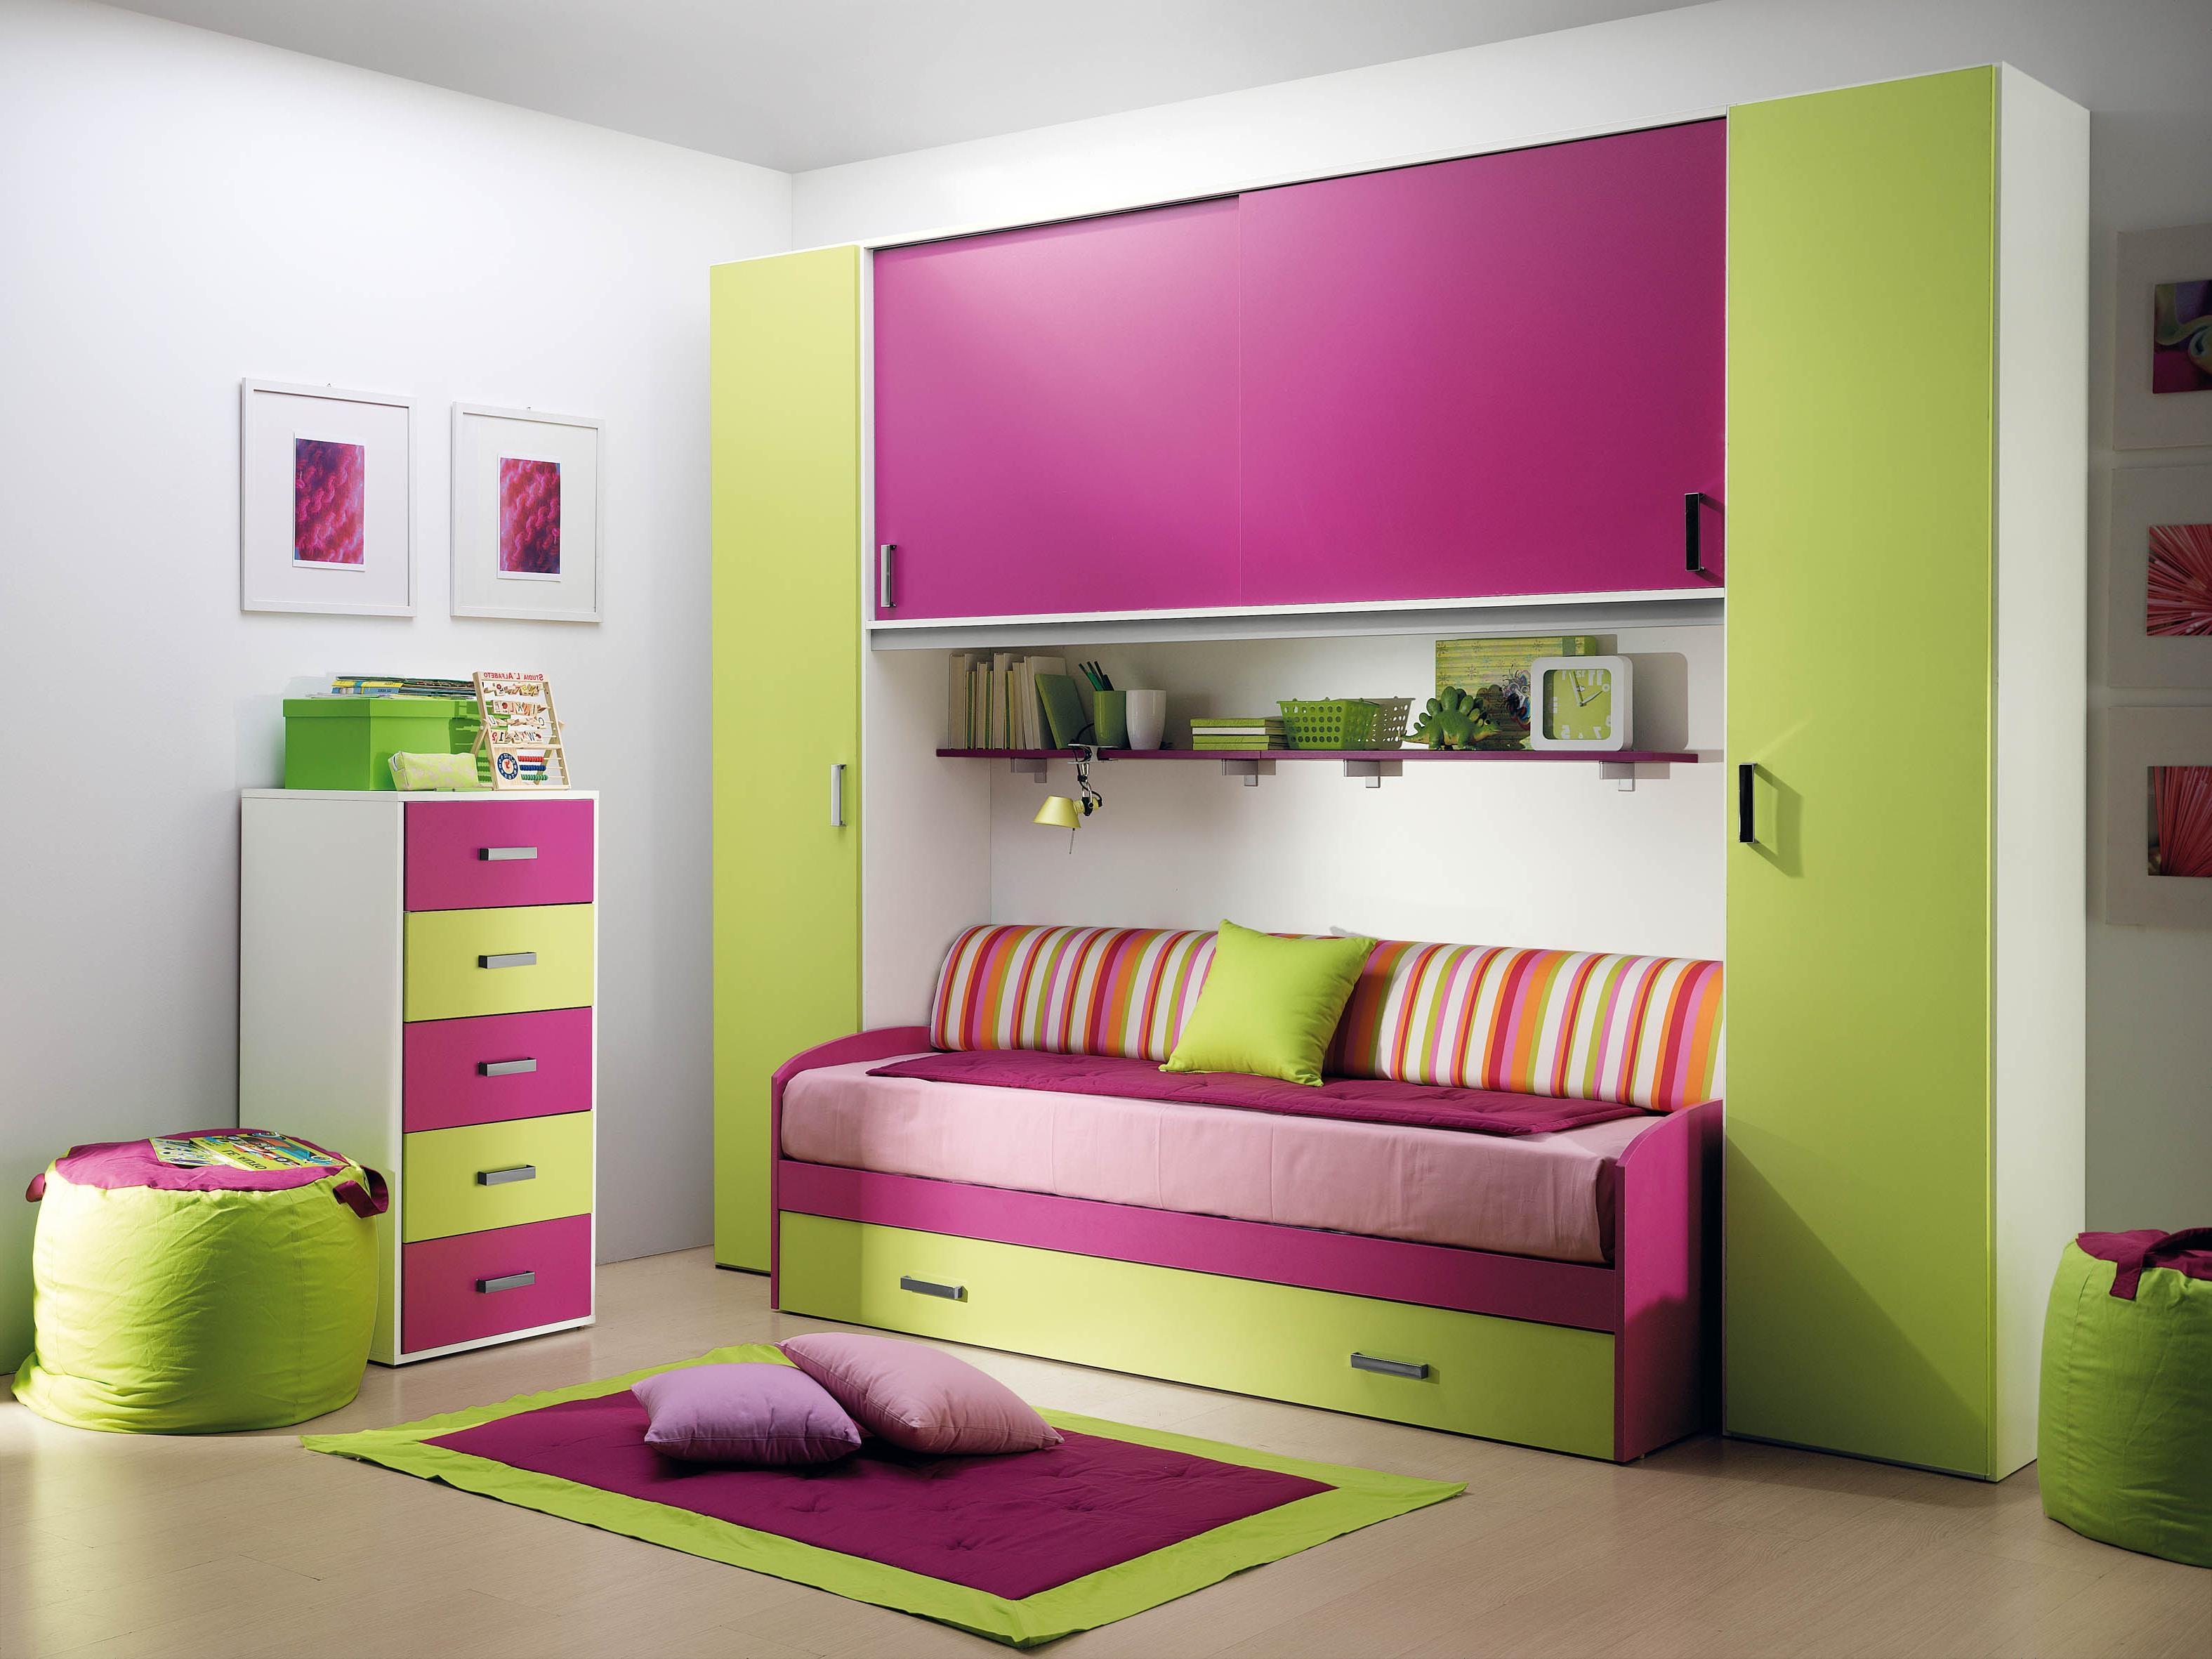 صور غرف نوم بنات , غرف حديثه للفتيات